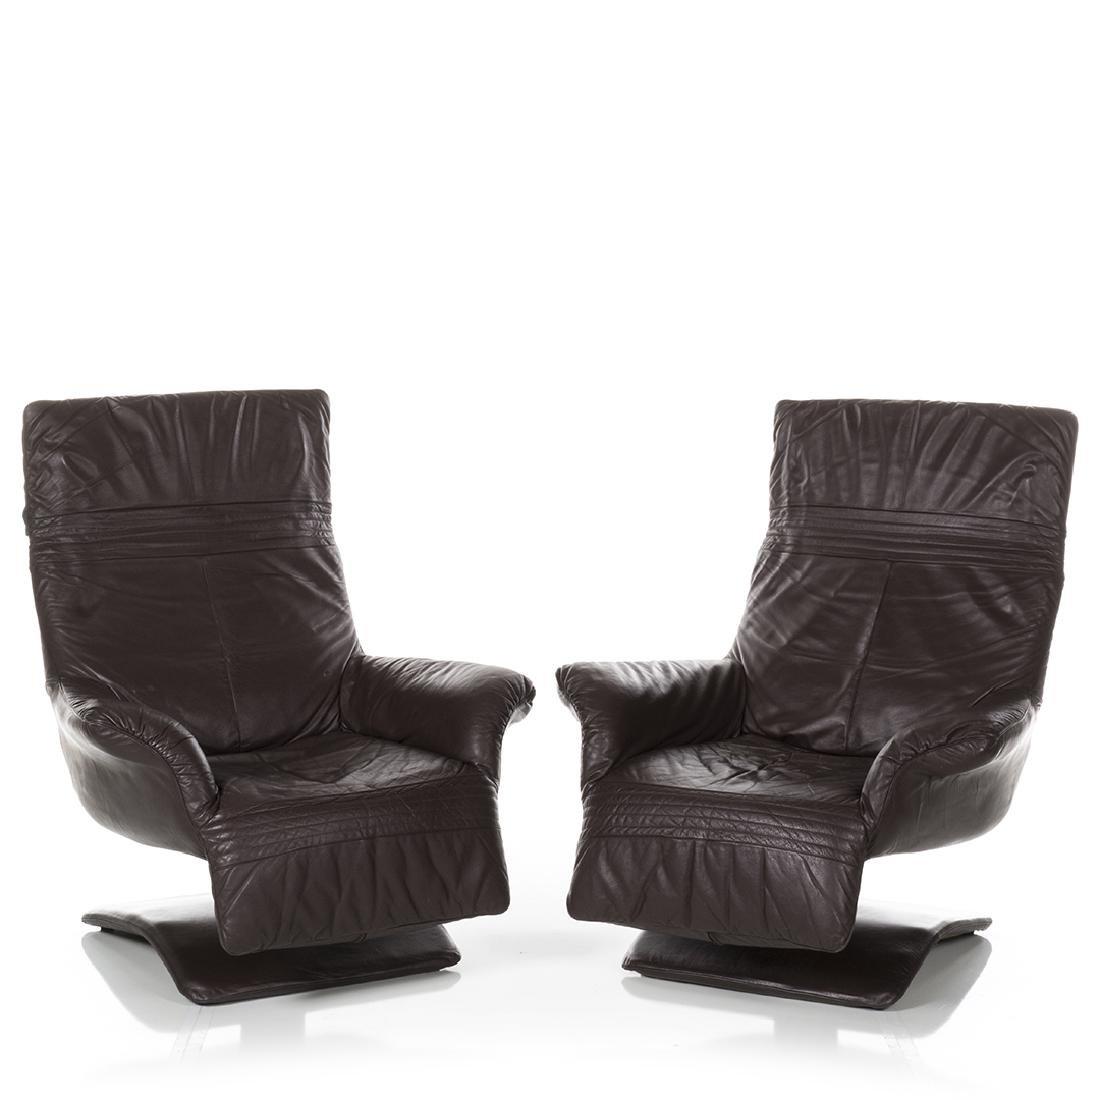 Scandinavian Leather Club Chairs (2) - 2